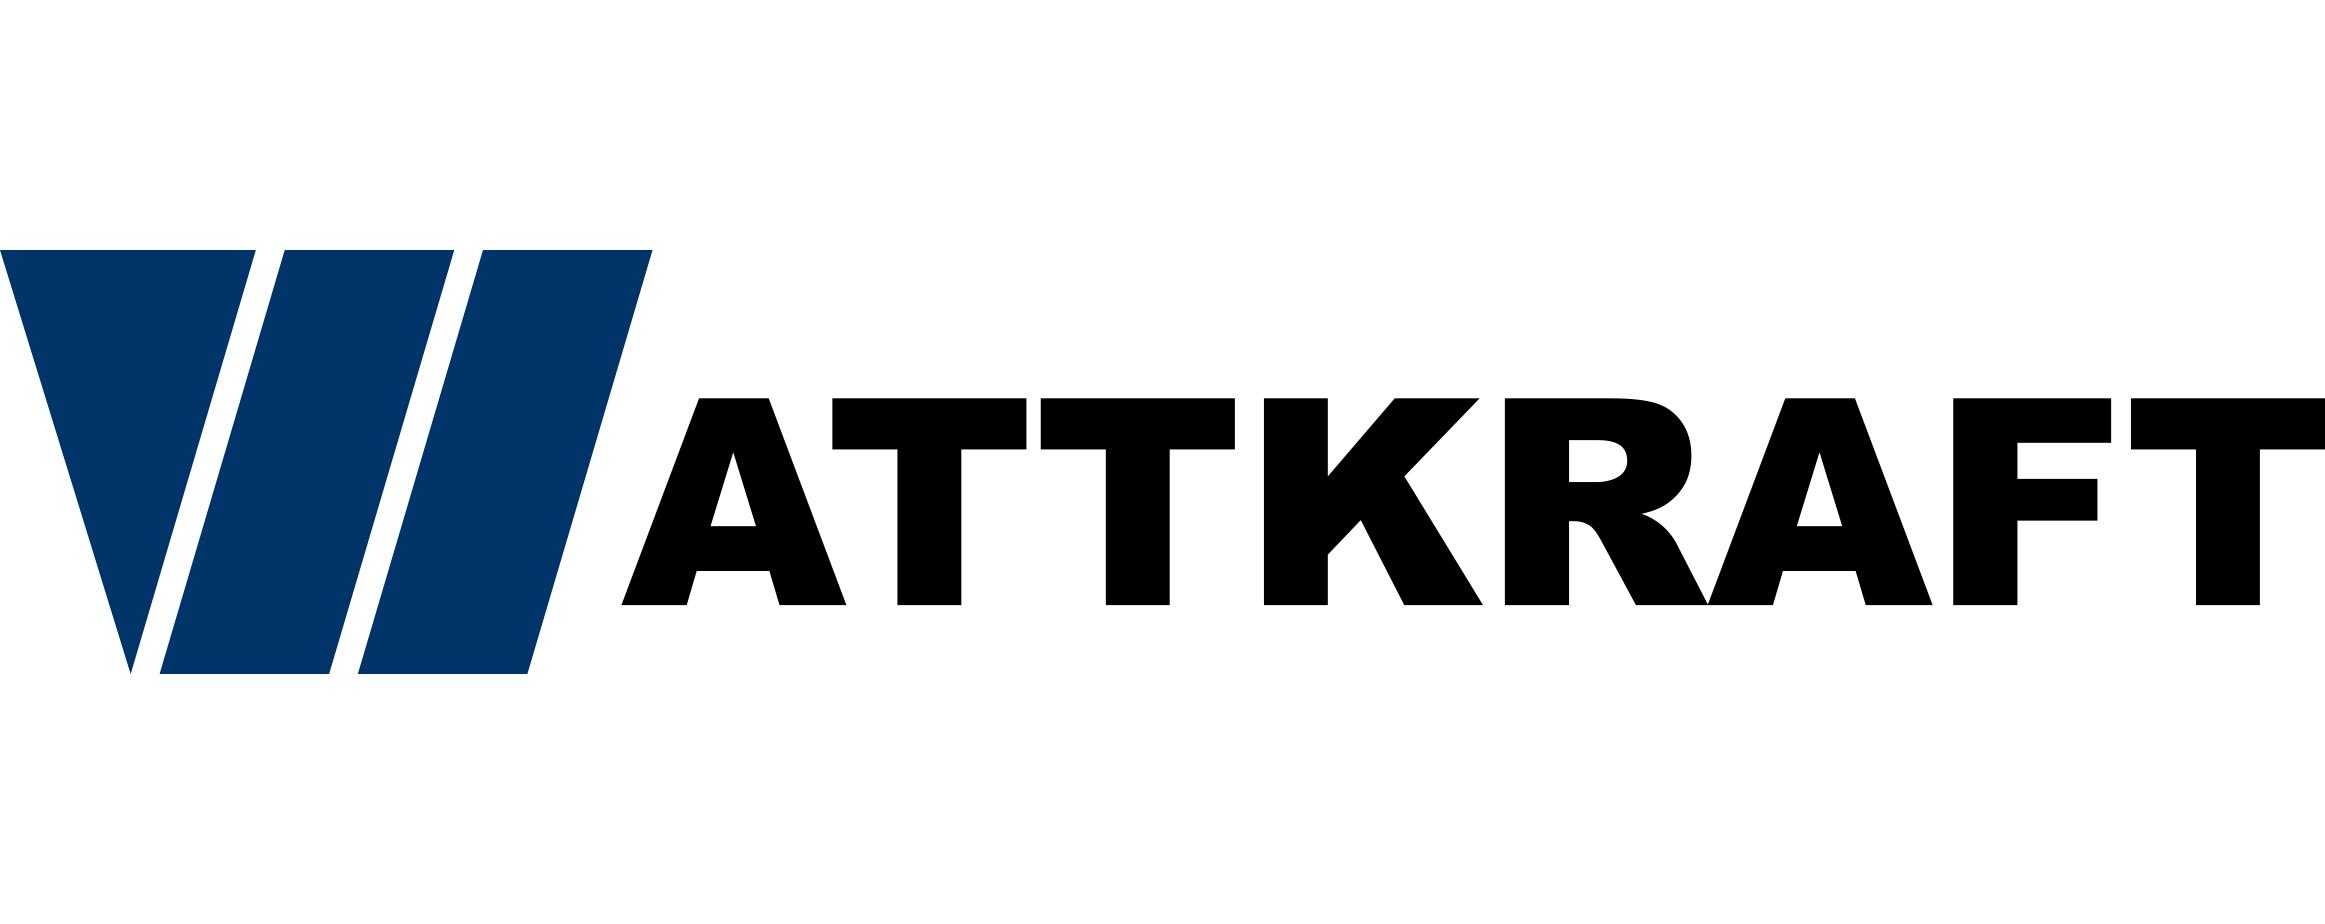 Logo - Wattkraft for Networking.jpg